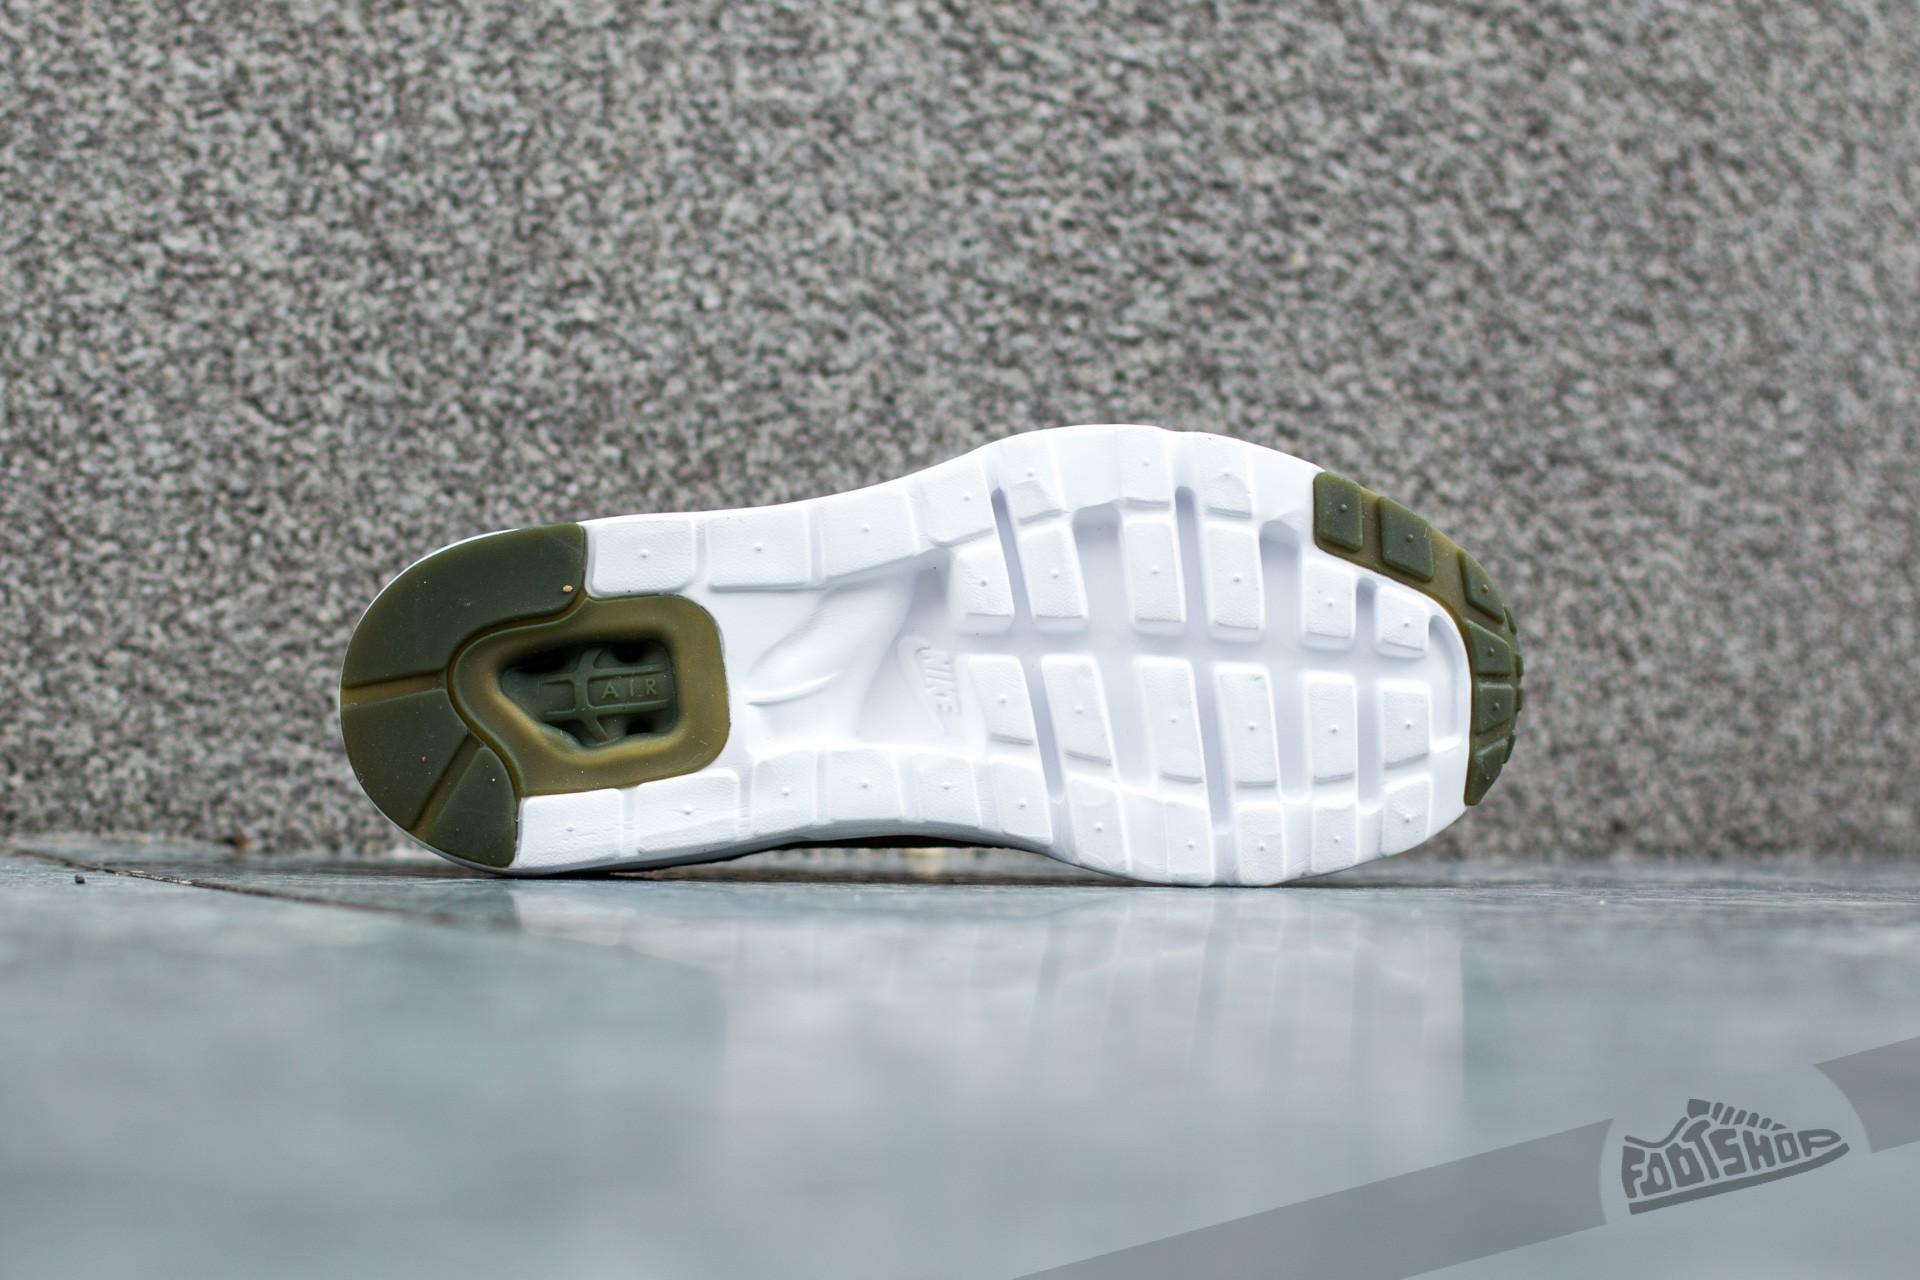 Nike Air Max 1 Ultra Flyknit Olive Flak Cargo Khaki Cargo Khaki White | Footshop